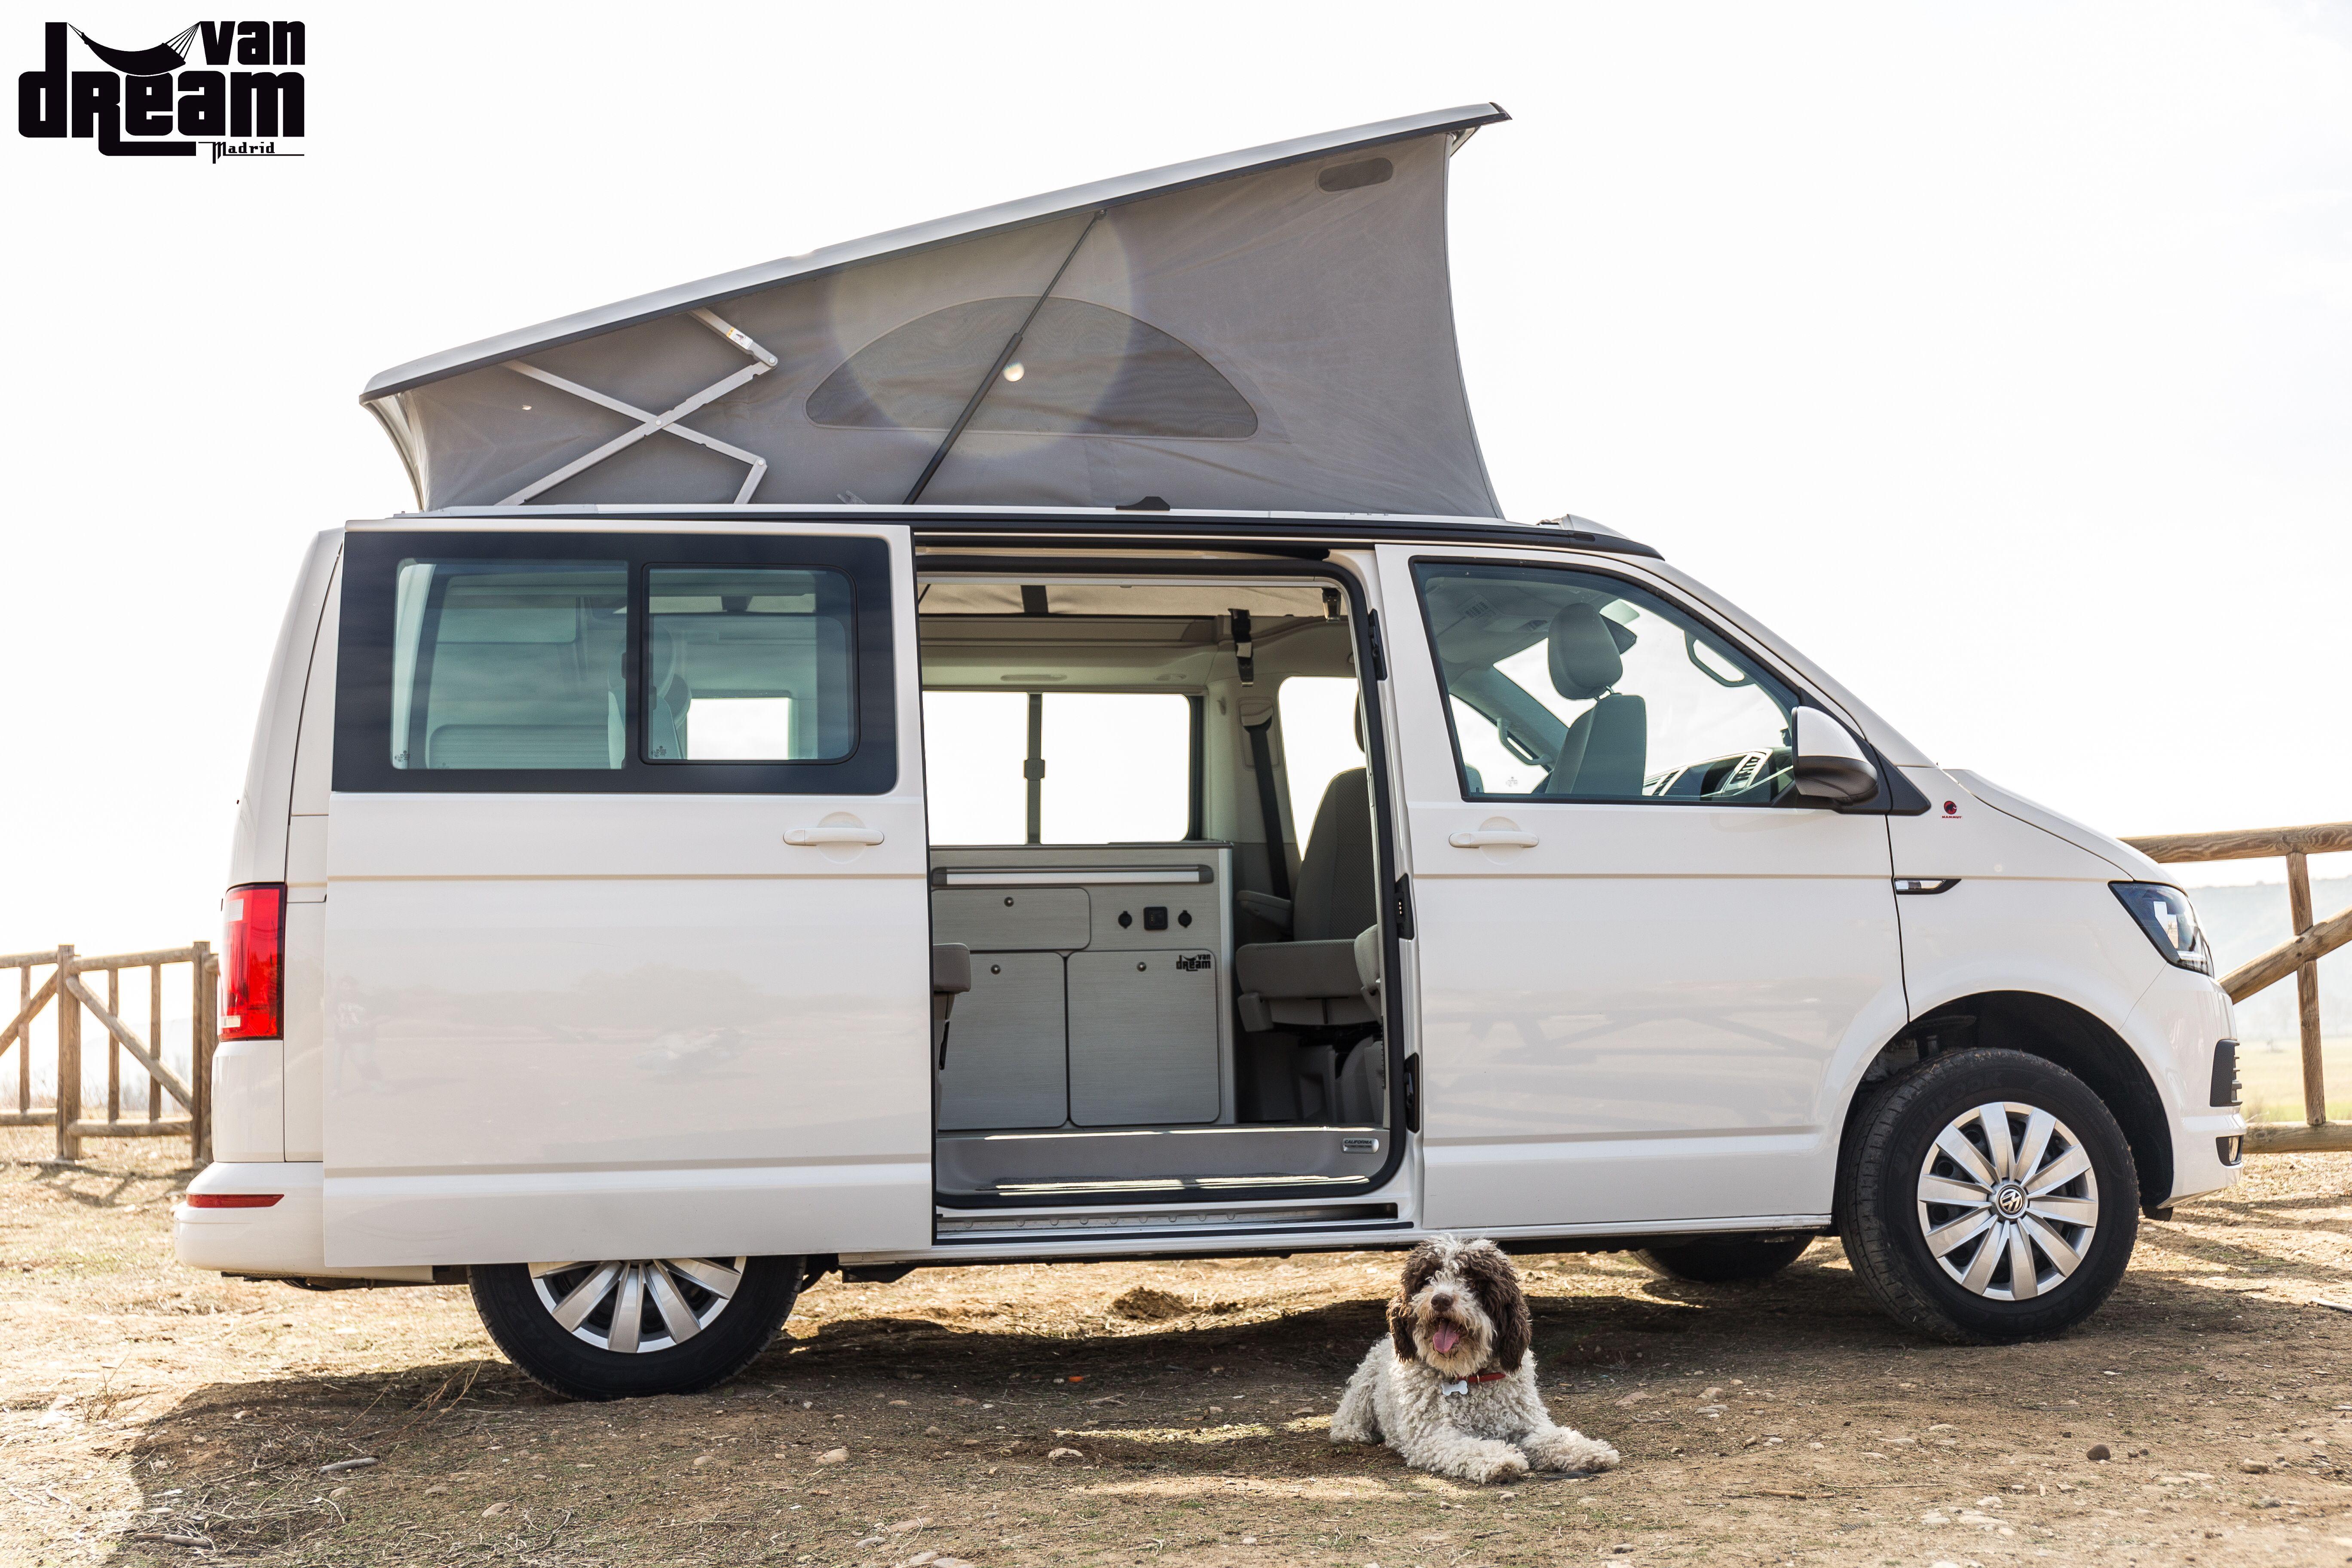 VW T5 California Beach kaufen auf Ricardo